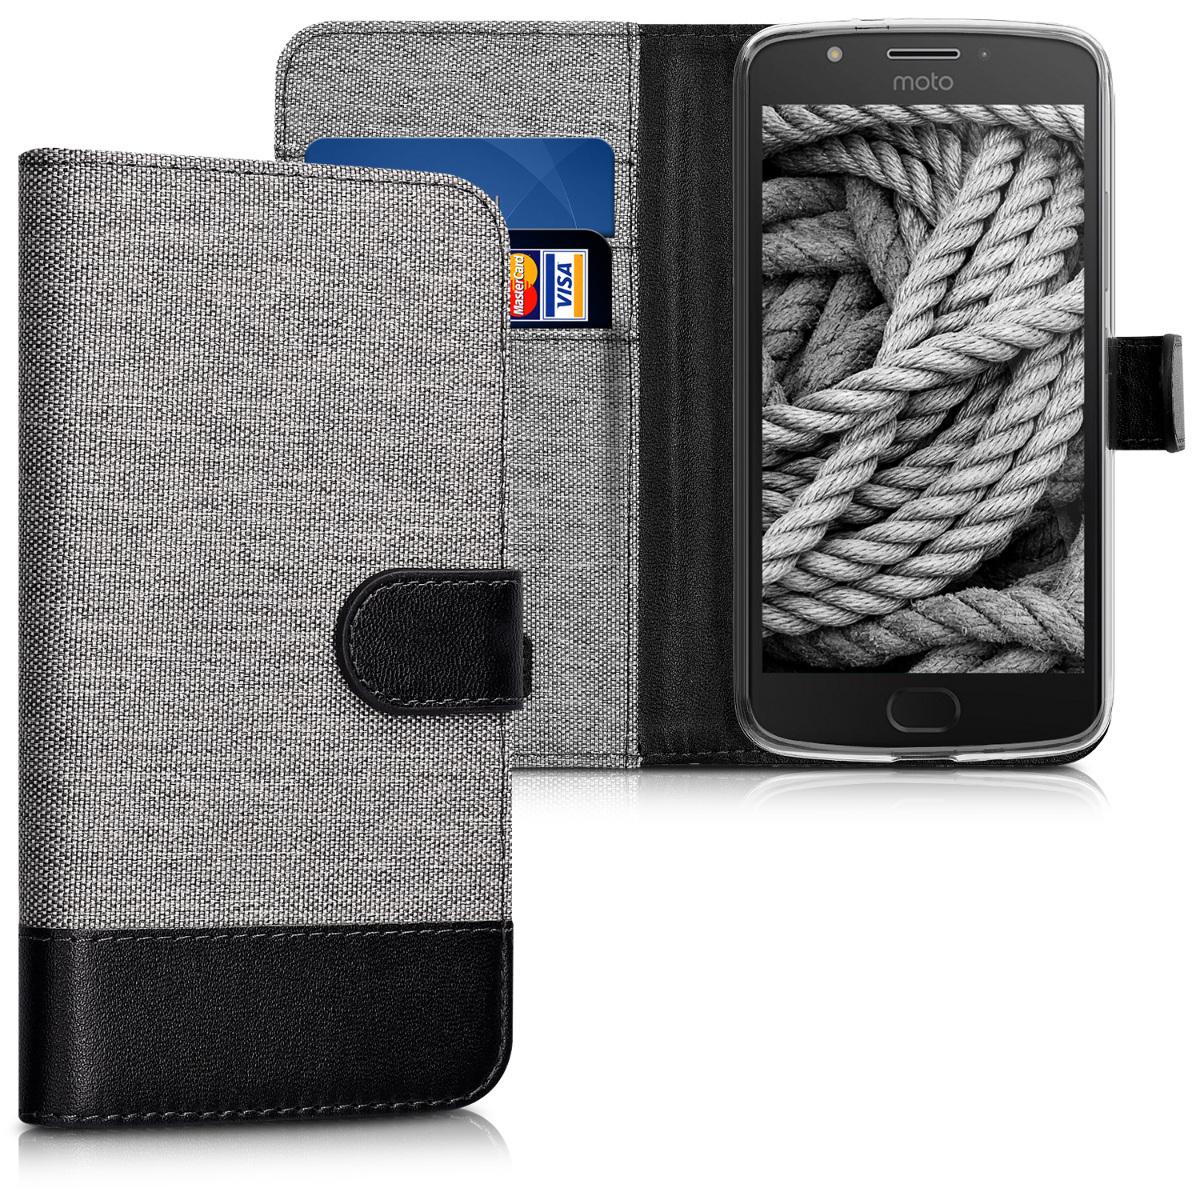 KW Θήκη Πορτοφόλι Motorola Moto E4 - Συνθετικό δέρμα - Grey / Black (42125.01)